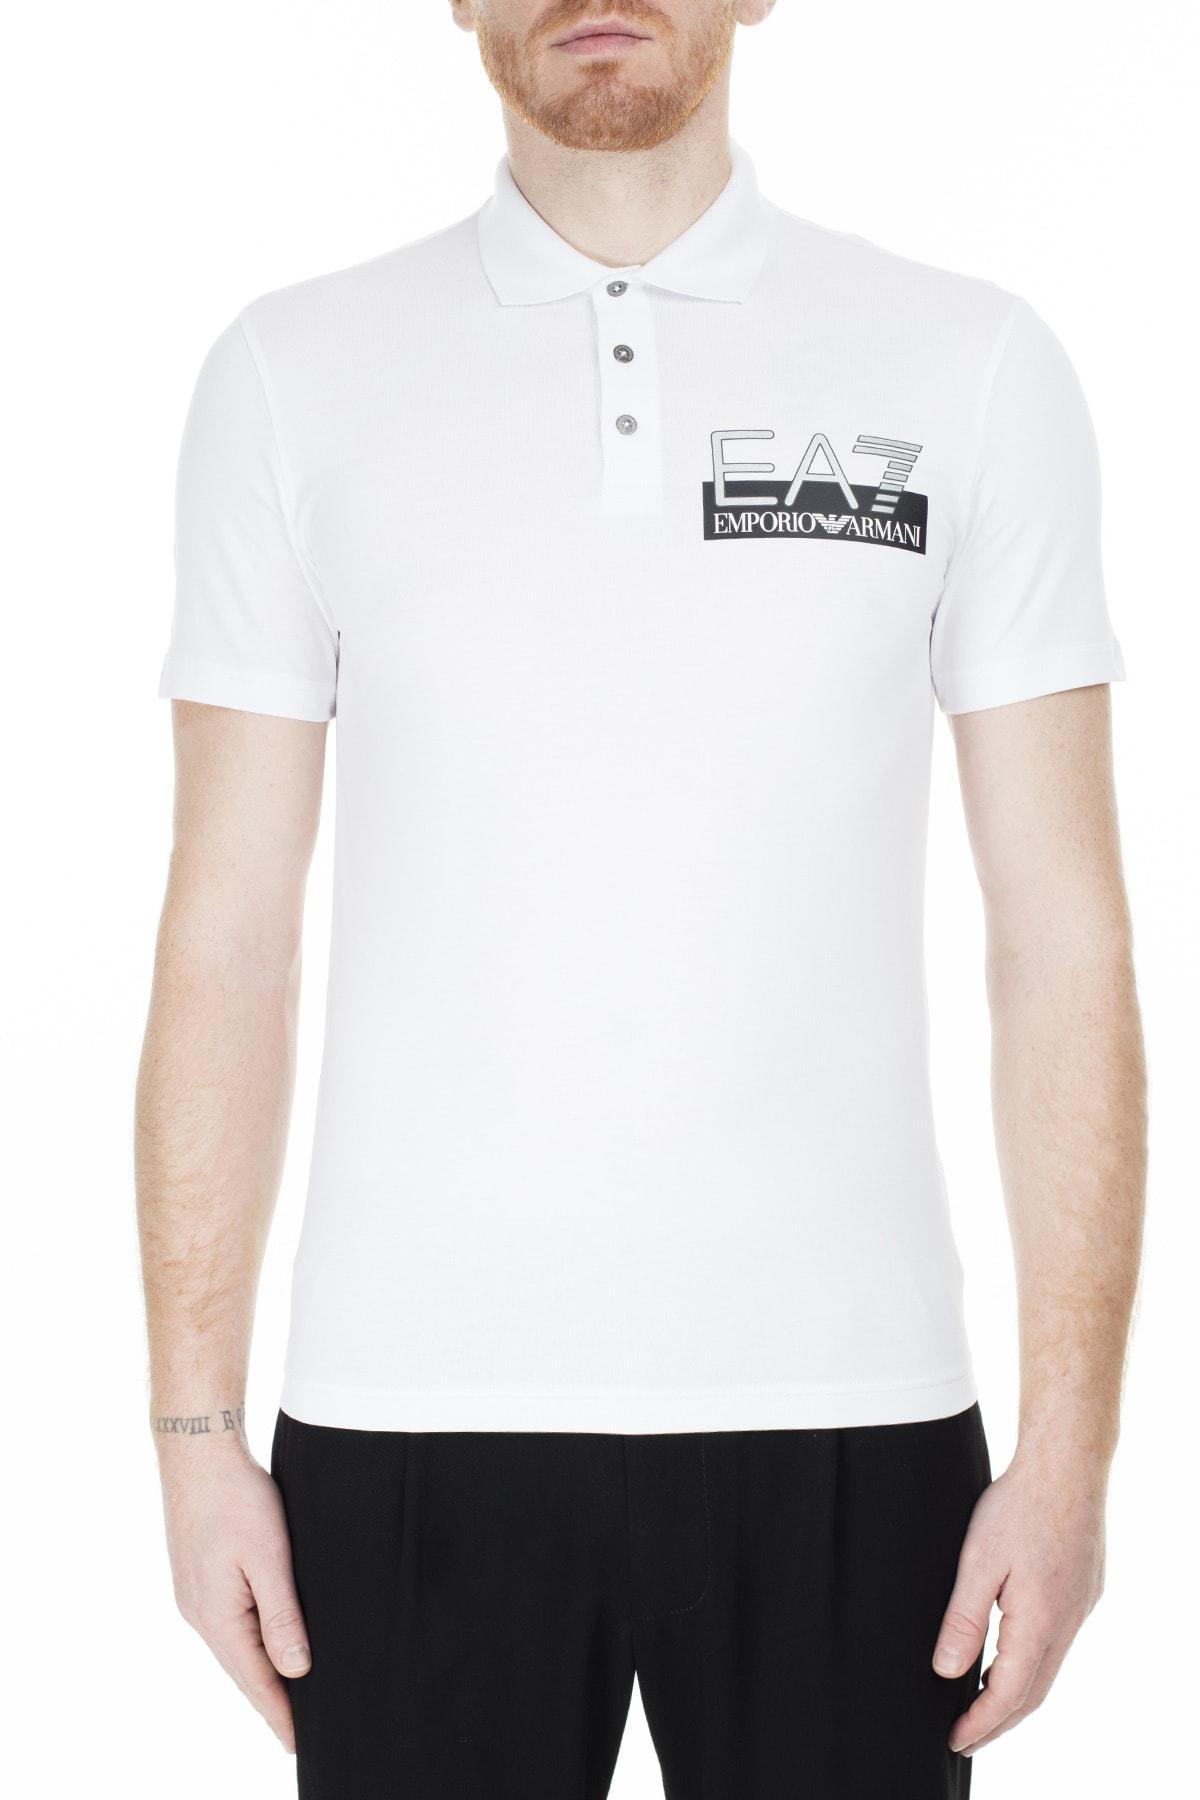 EA7 Regular Fit Polo T Shirt Erkek Polo S 6Gpf16 Pj03Z 1100 1